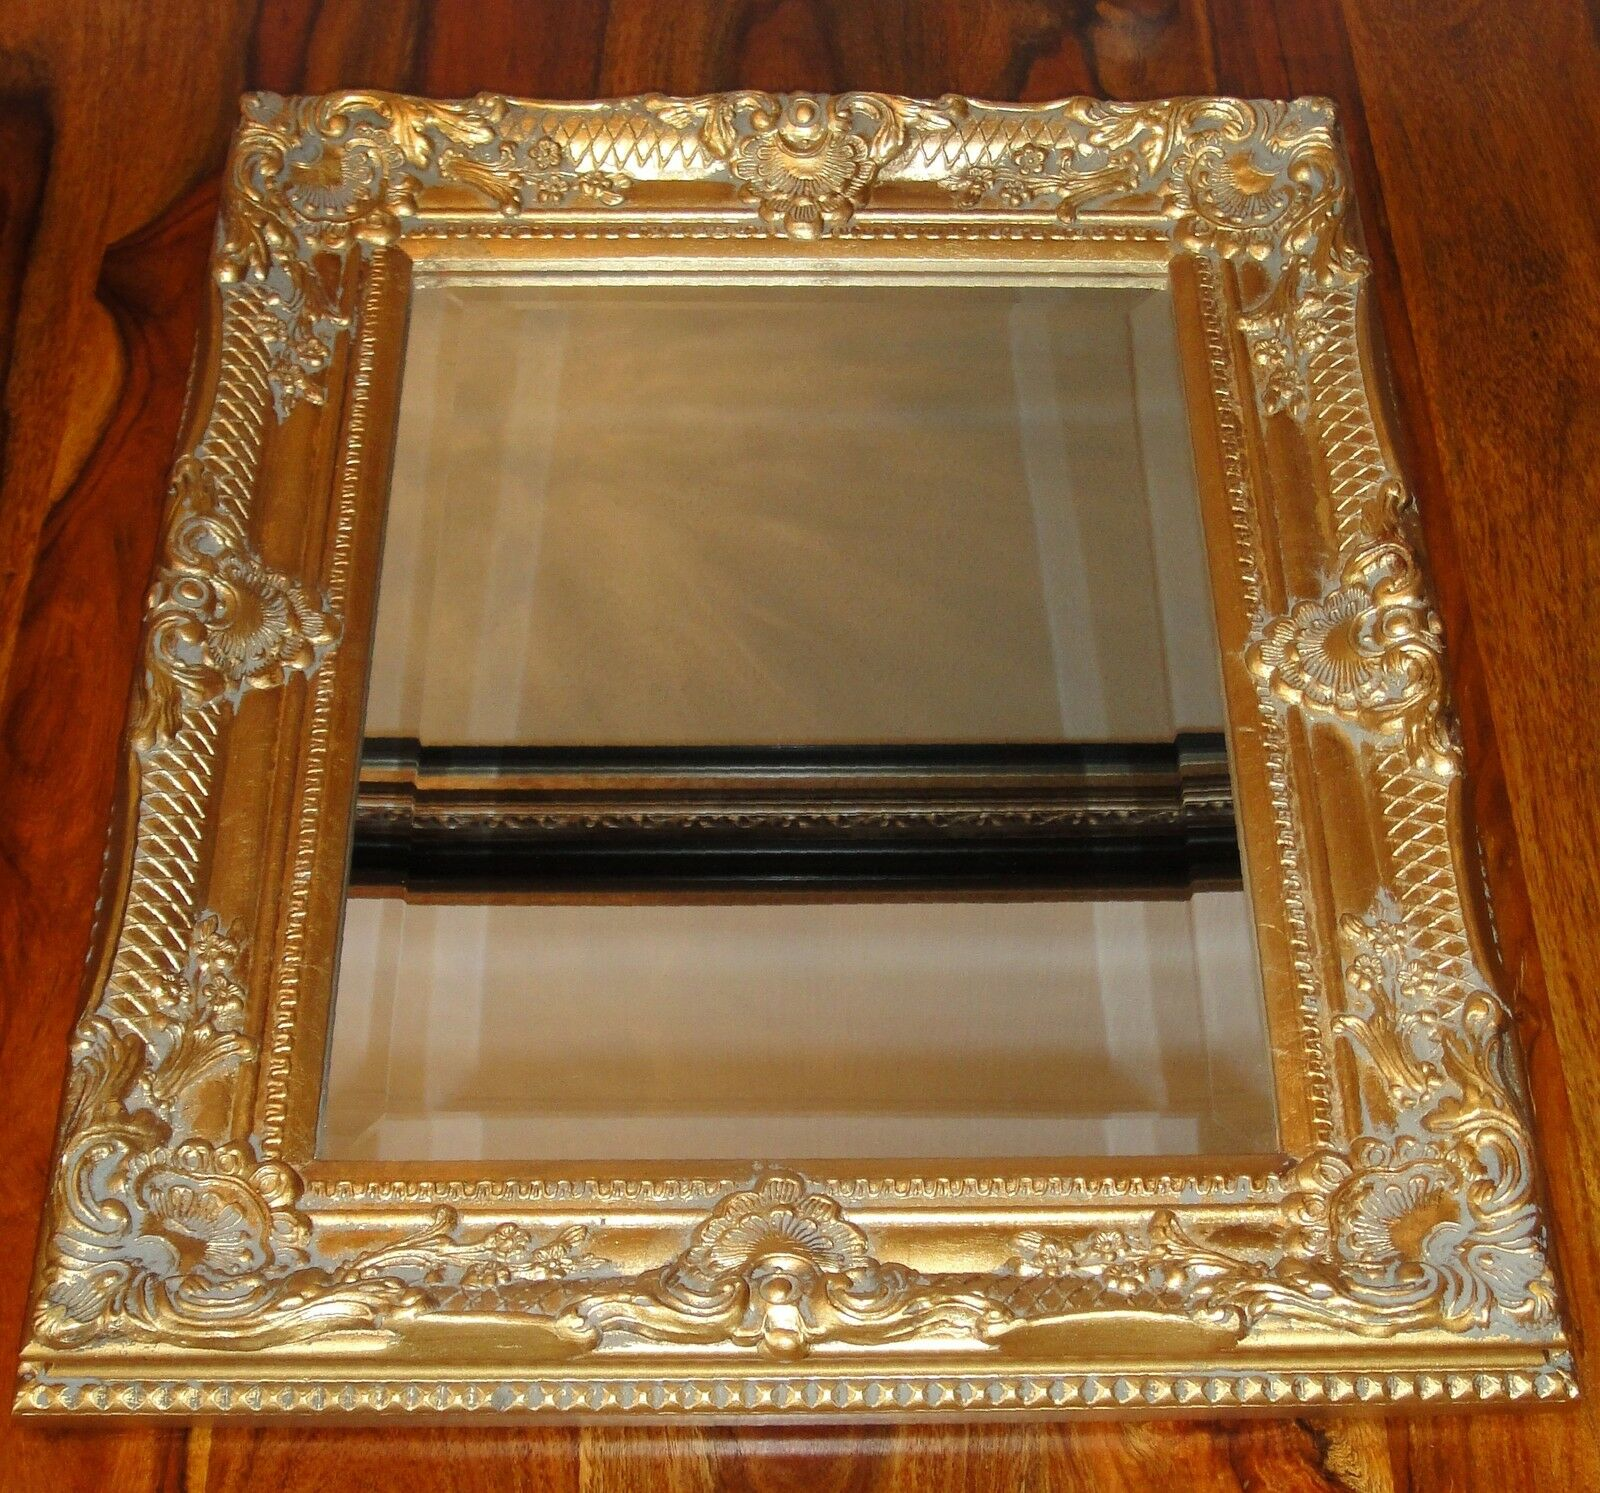 Rahmenspiegel Fiona 40 x 140cm Gold Designspiegel Wandspiegel Goldrahmen Deko